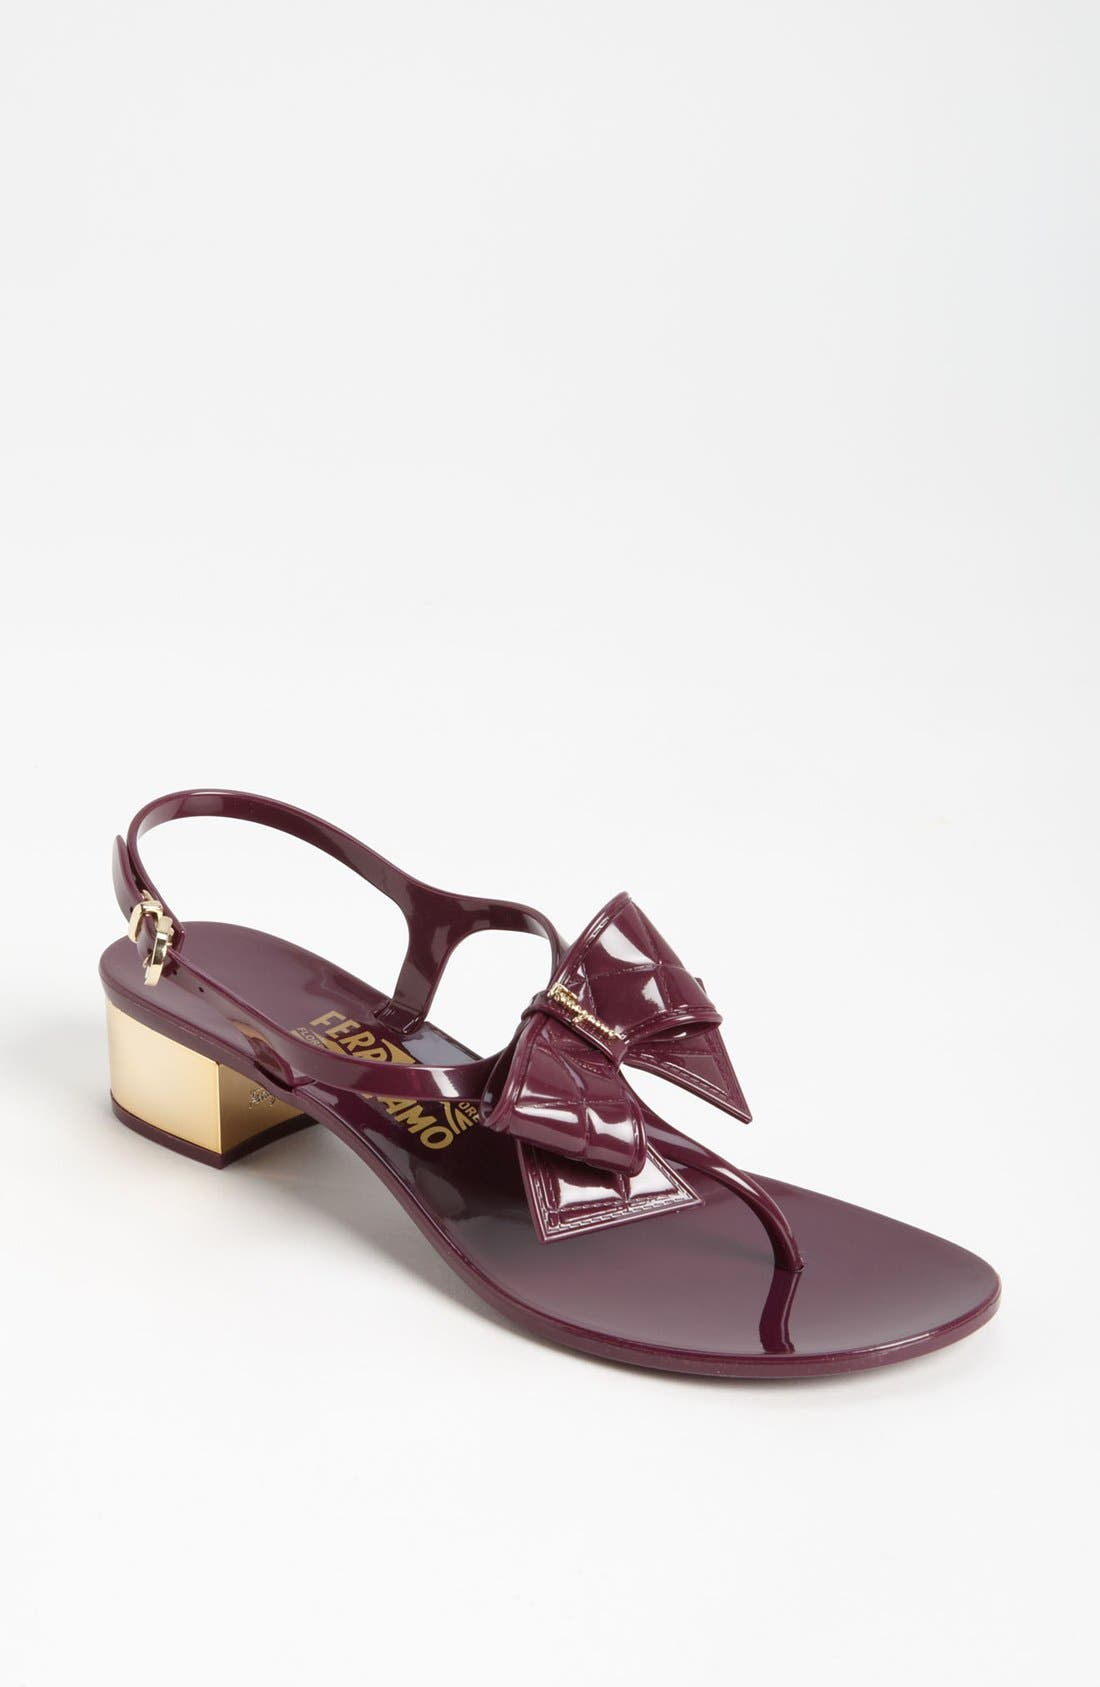 Main Image - Salvatore Ferragamo 'Sunshine' Sandal